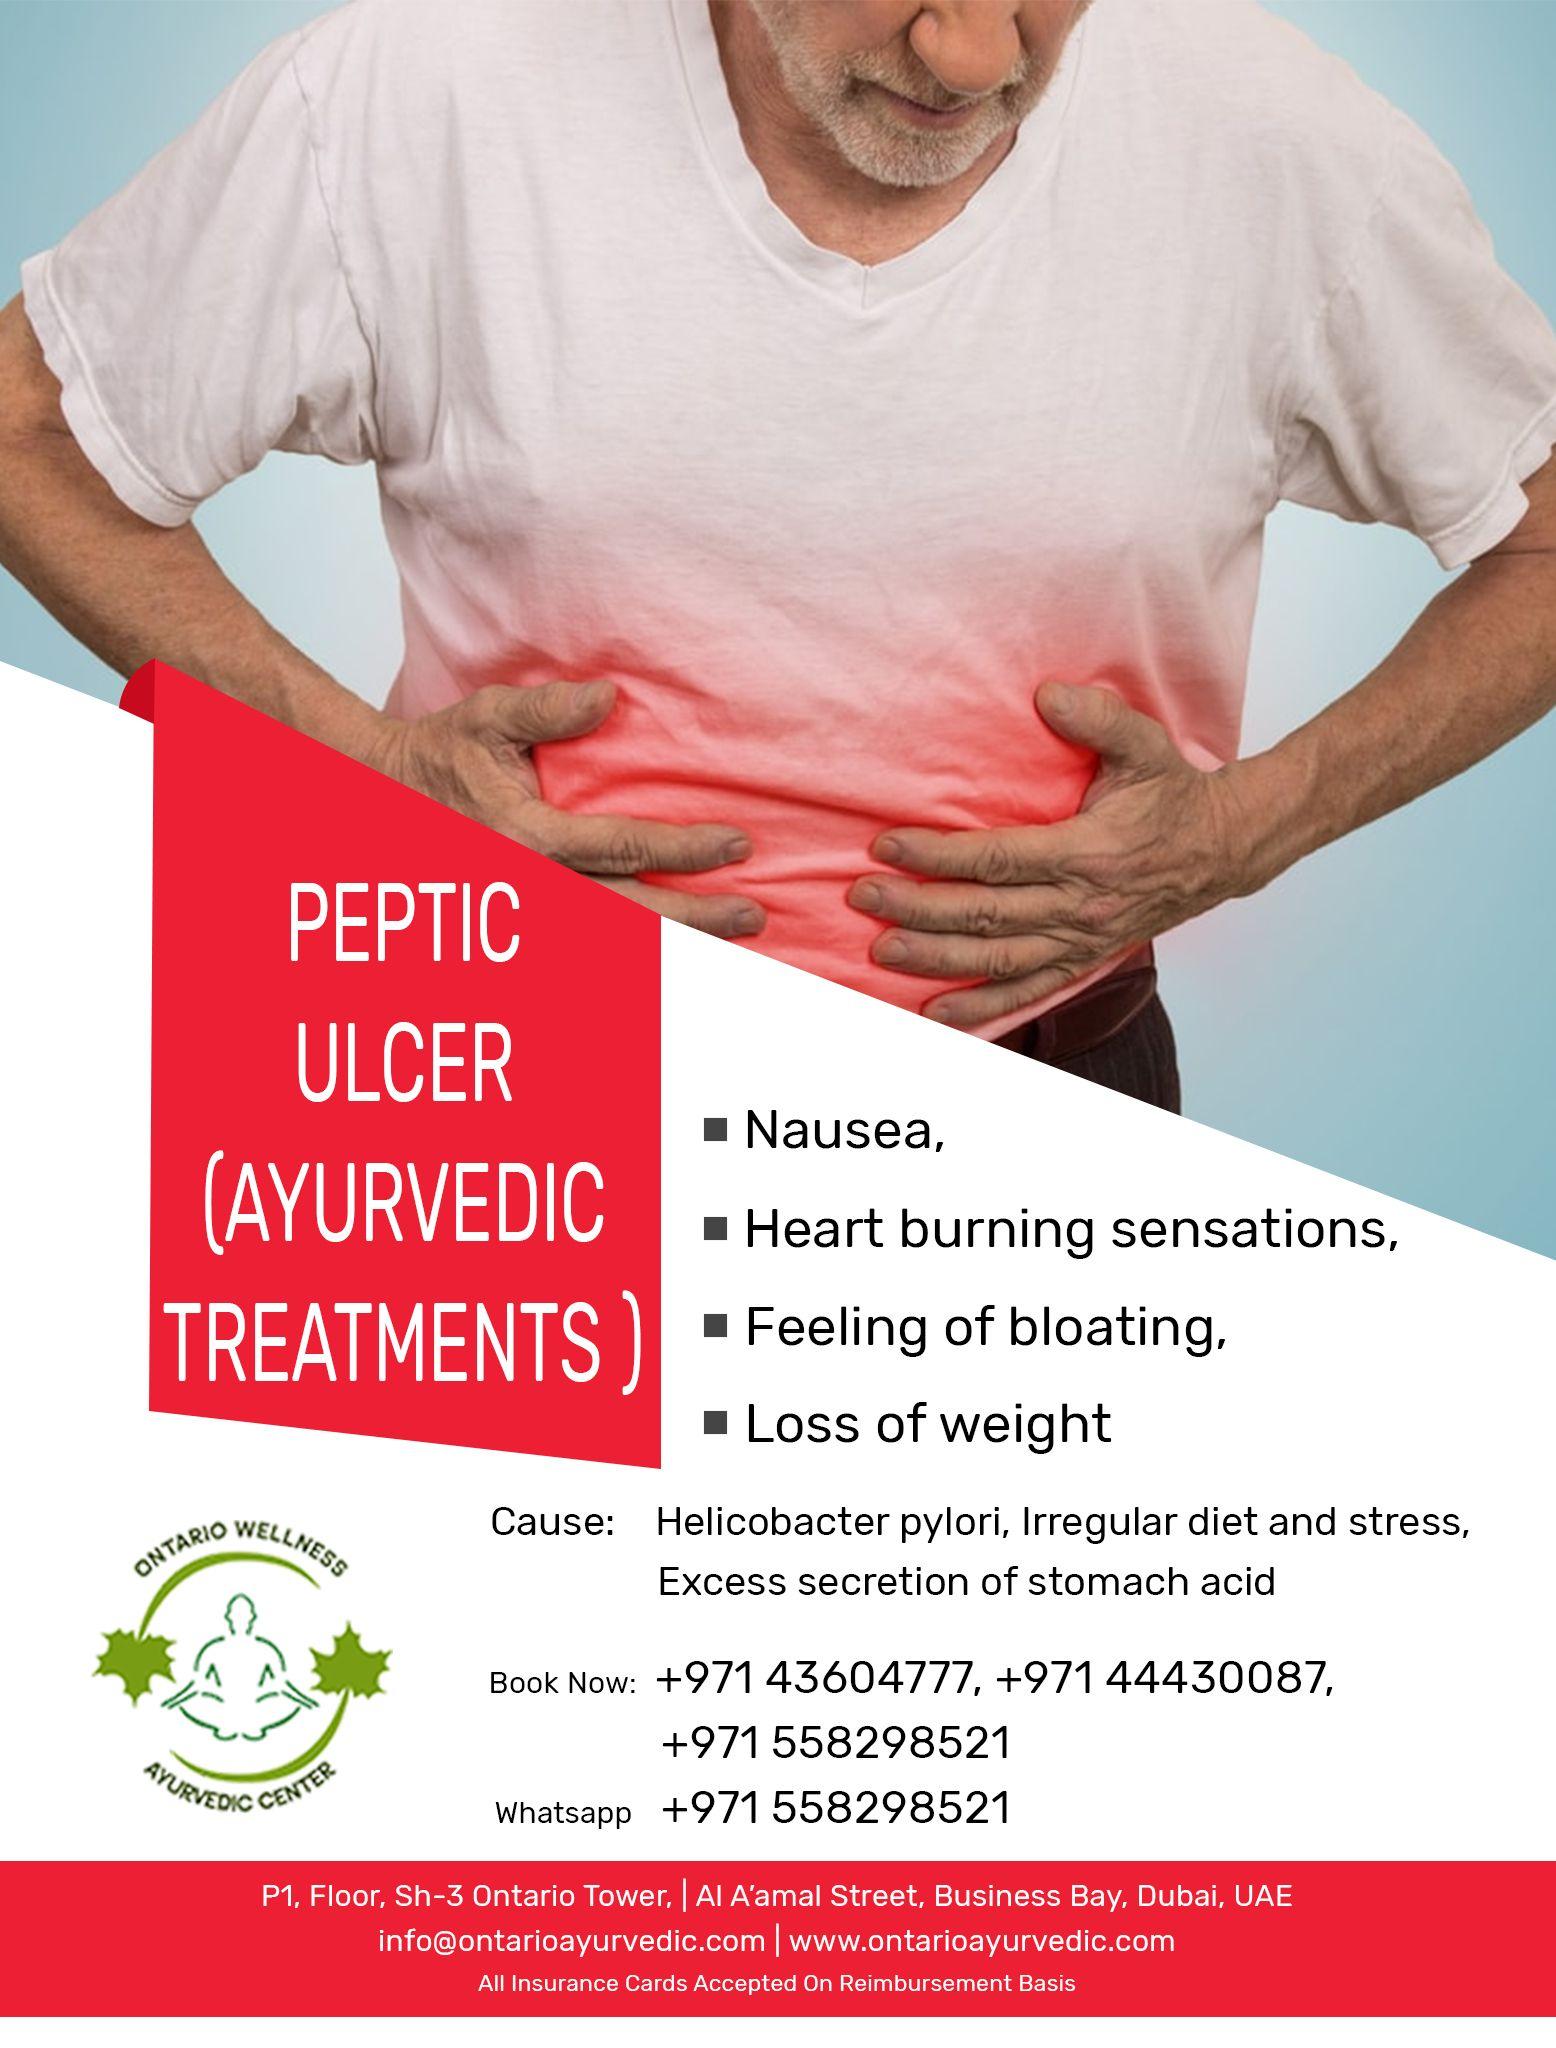 Ontario Ayurvedic Wellness Center LLC Peptic Ulcer (Ayurvedic